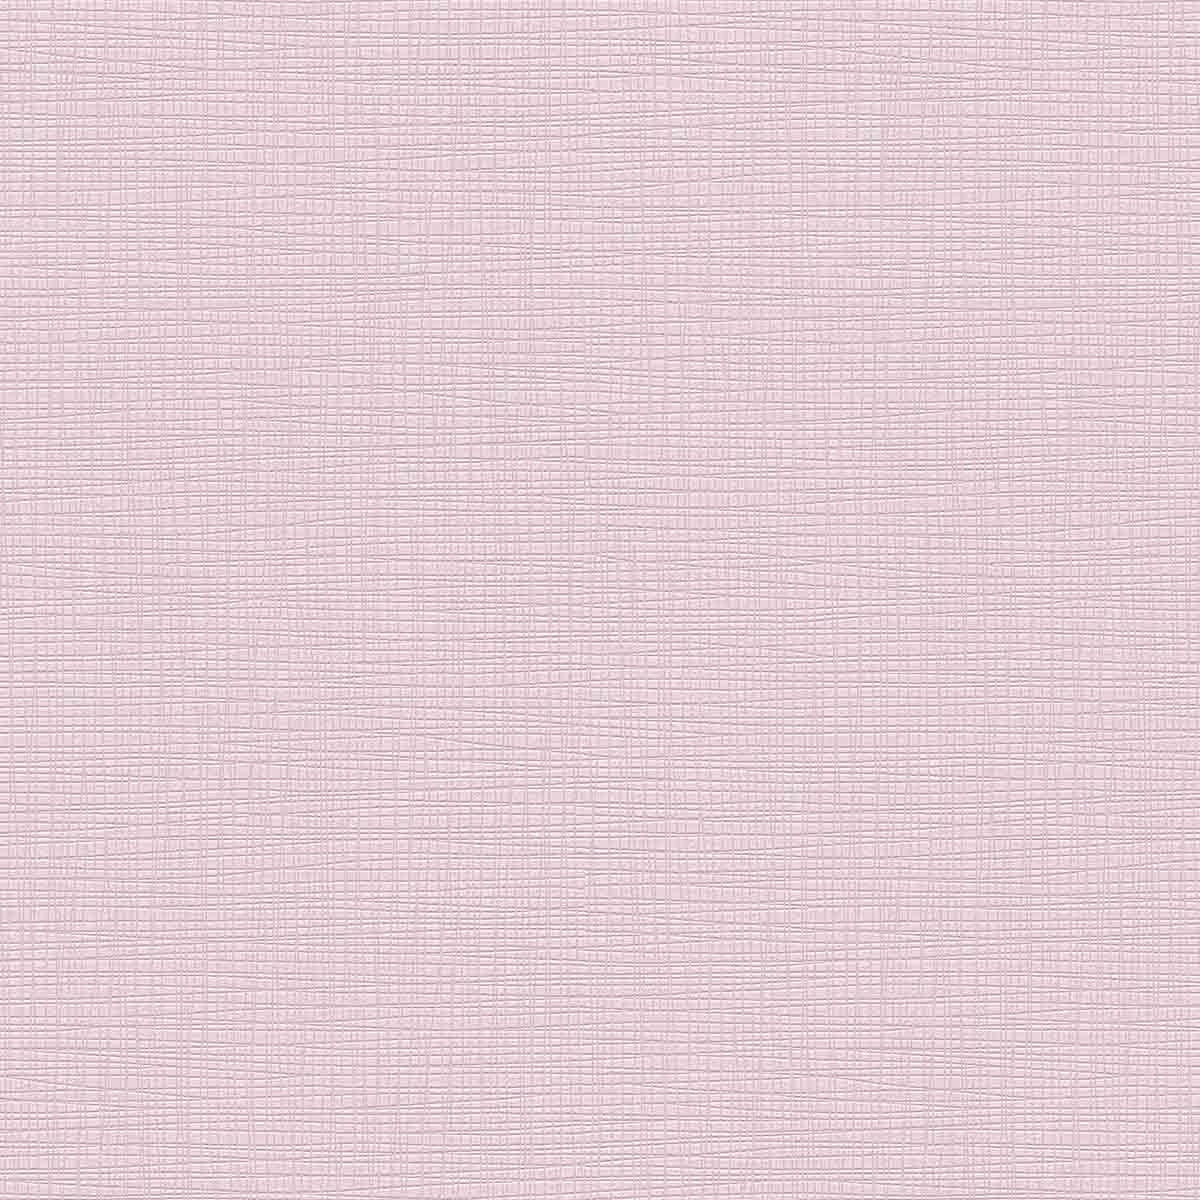 тапет Бестселър 3 мрежа розово